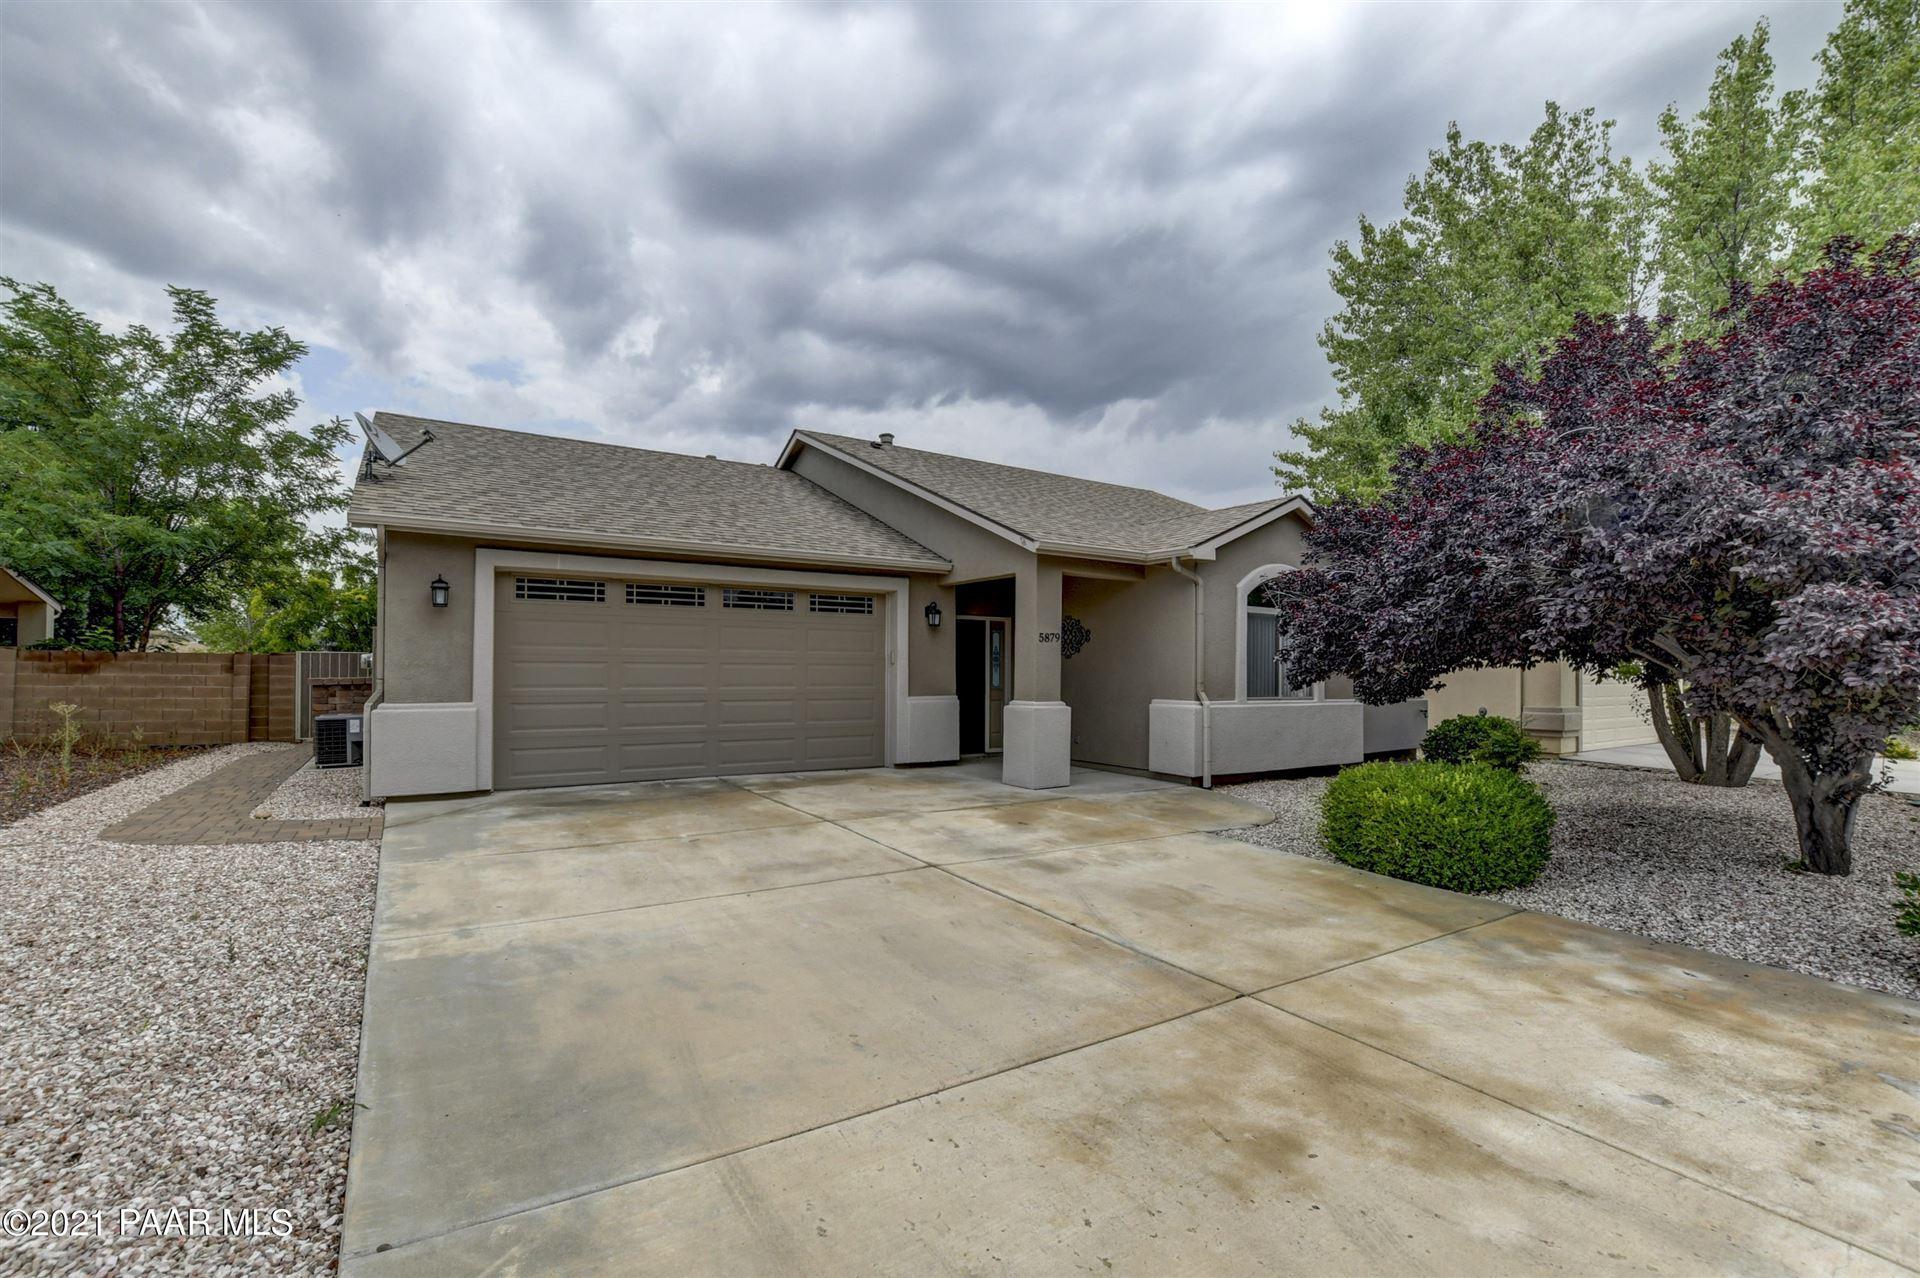 Photo of 5879 N Bronco Lane #Lot: 489, Prescott Valley, AZ 86314 (MLS # 1040494)